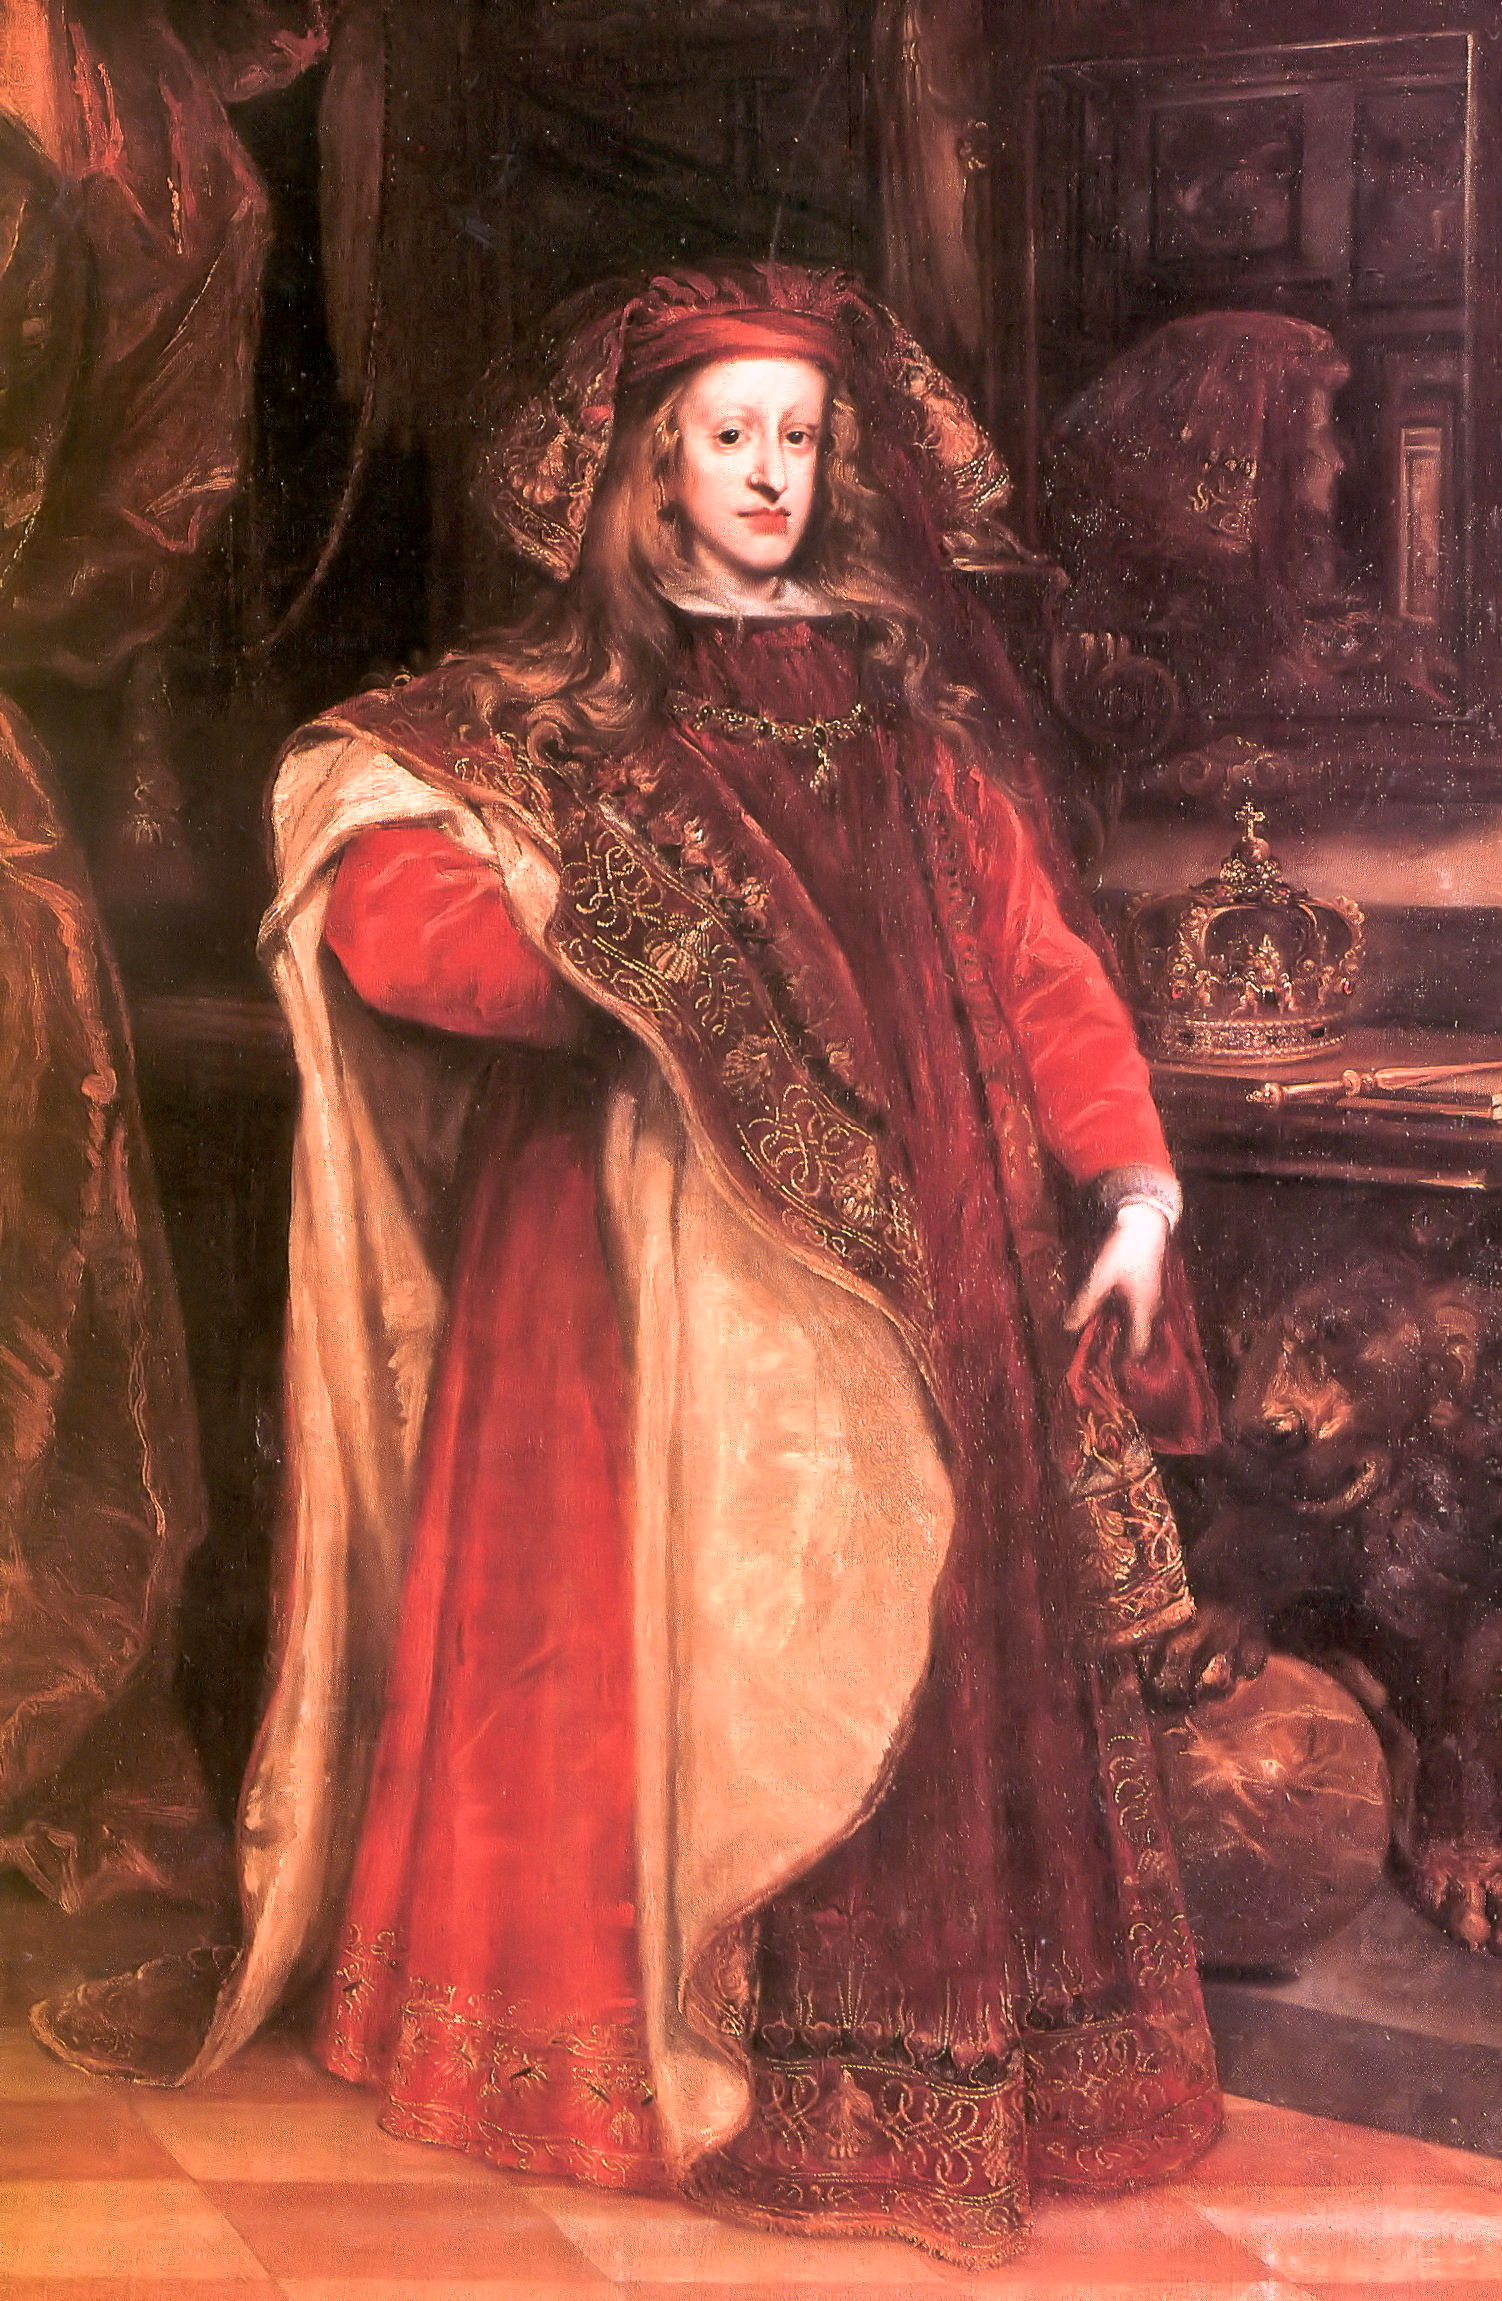 http://historiadoreshistericos.files.wordpress.com/2010/04/carlos_ii_koning_van_spanje-153353311.jpg